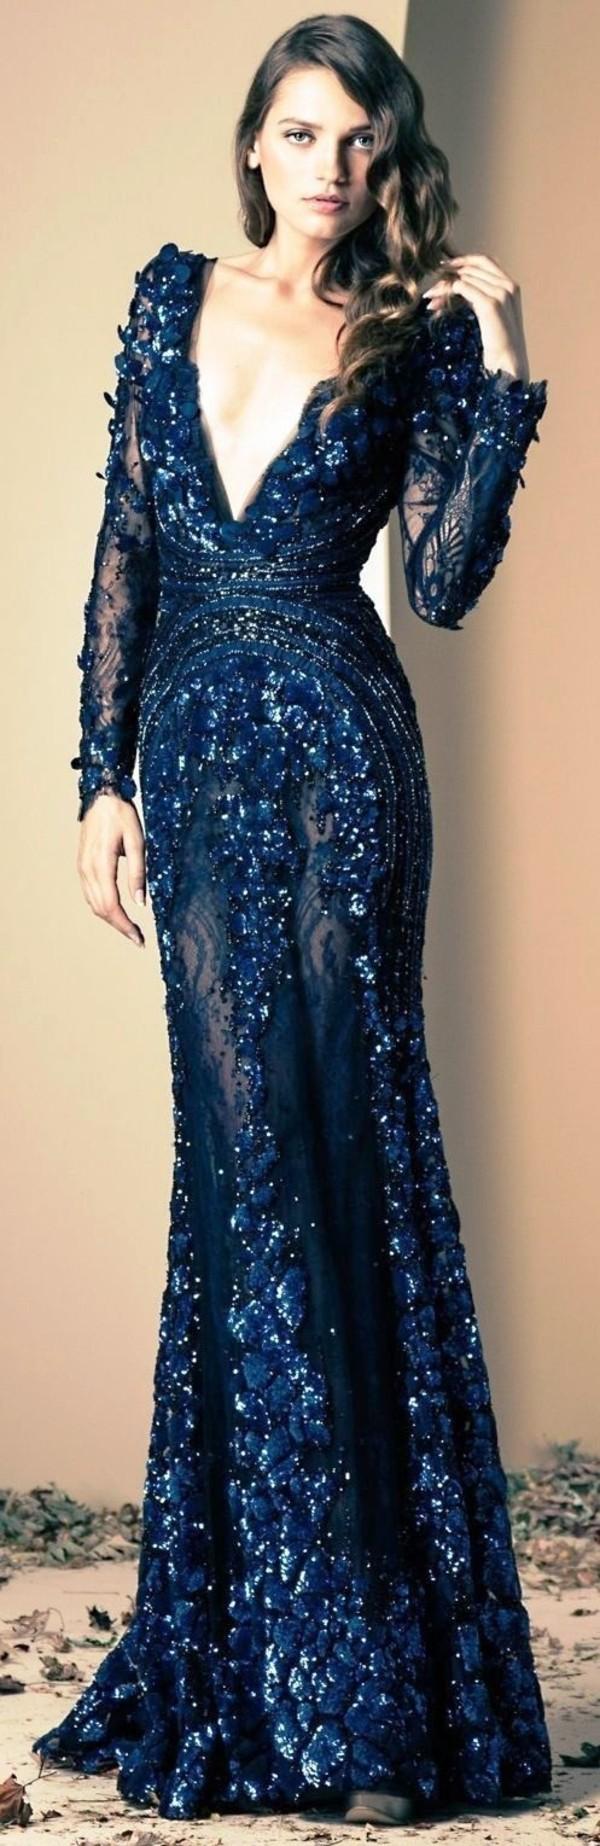 dress prom prom dress blue navy low cut long dress